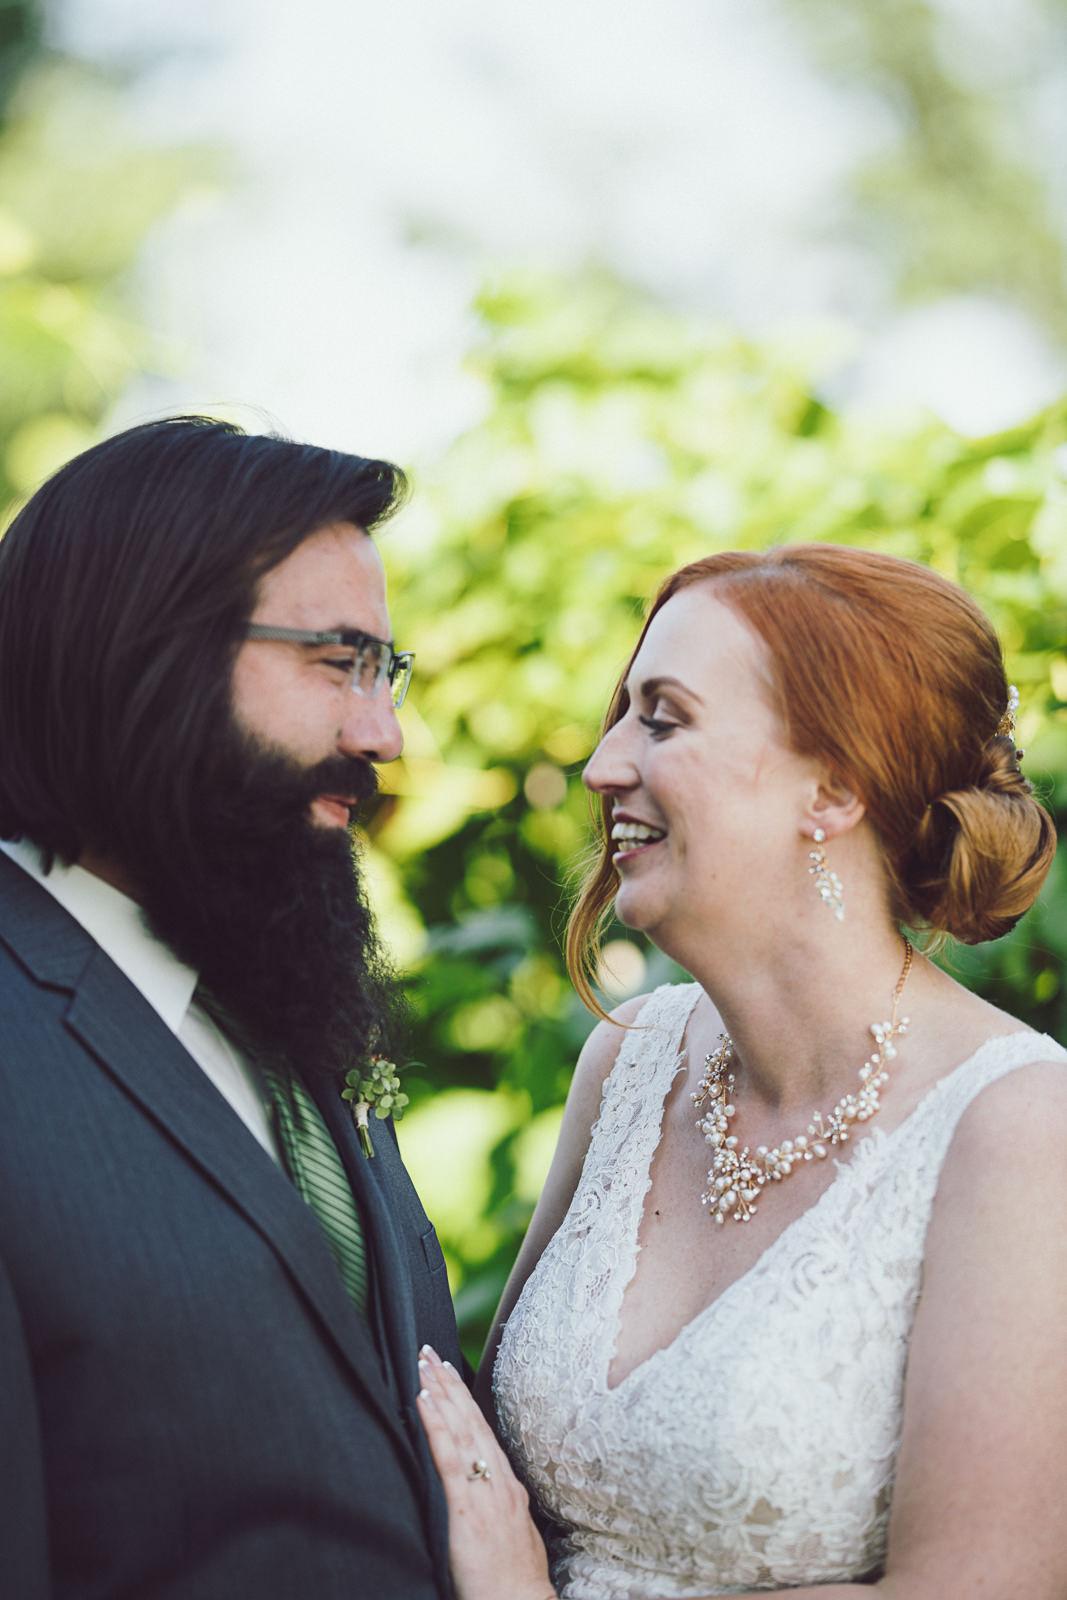 wedding-keely-caleb-233-name-your-photo.jpg